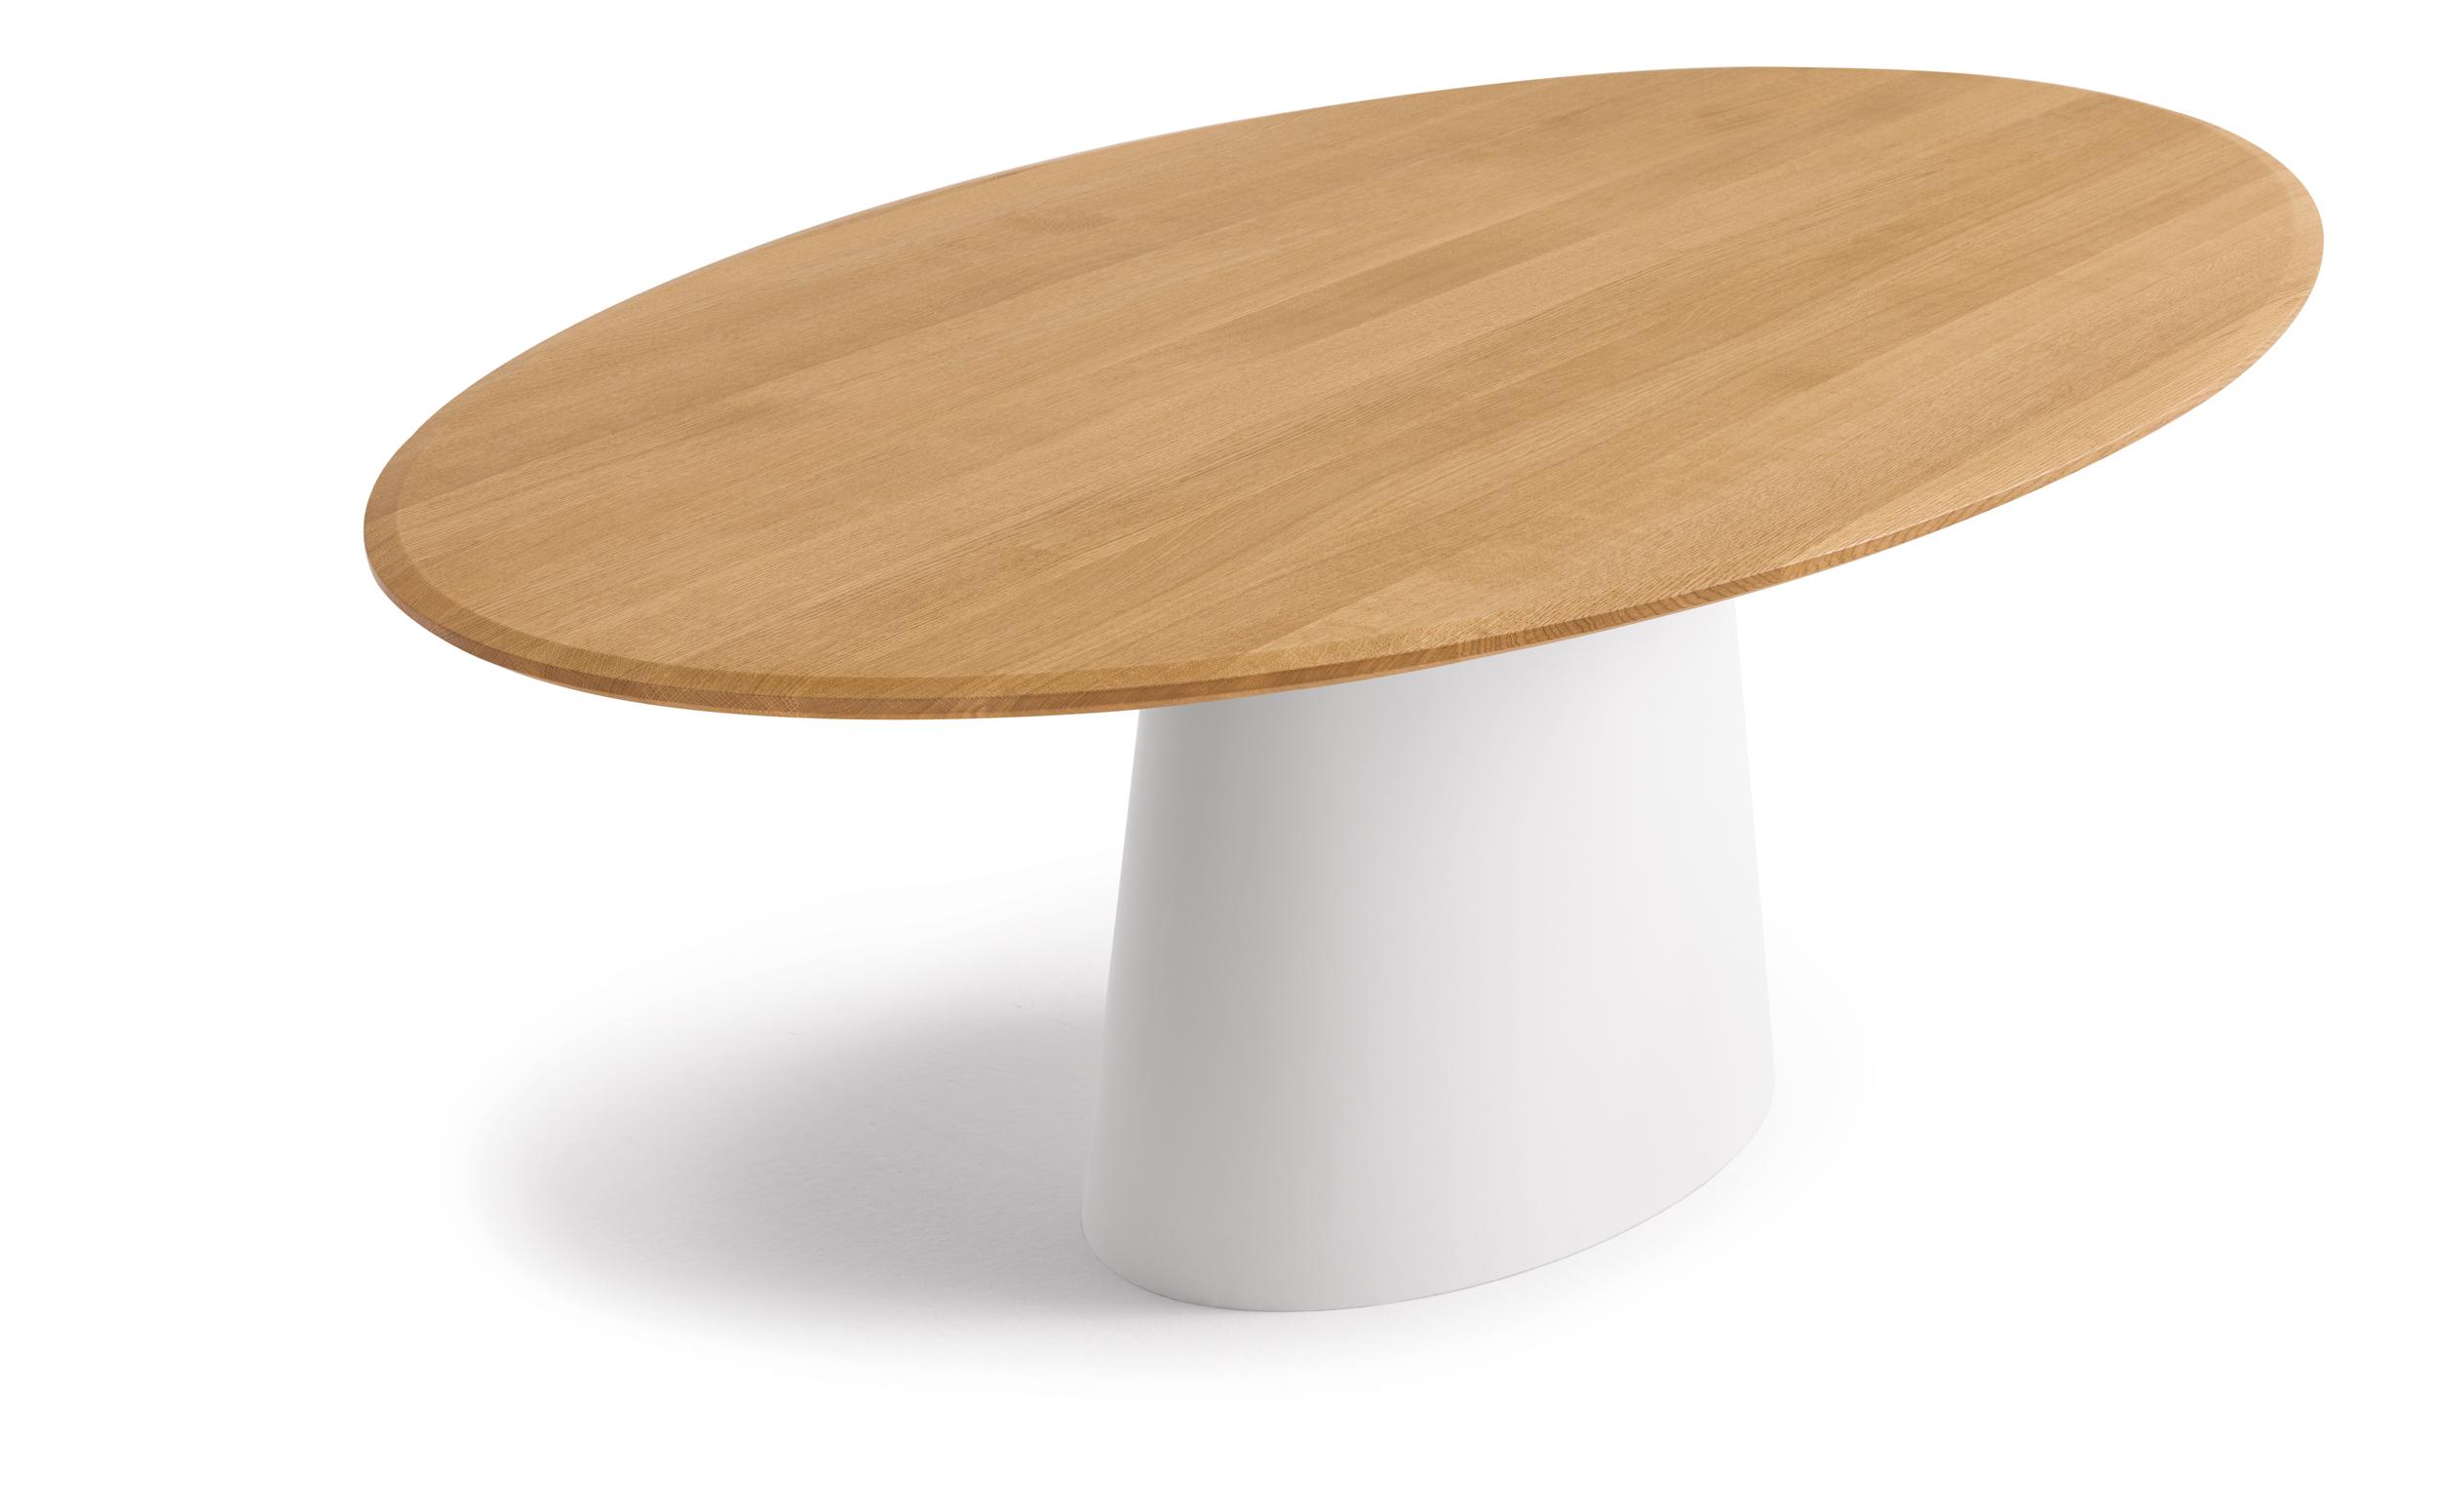 Tisch Jalis Cor ~ Conic Tisch Professional COR